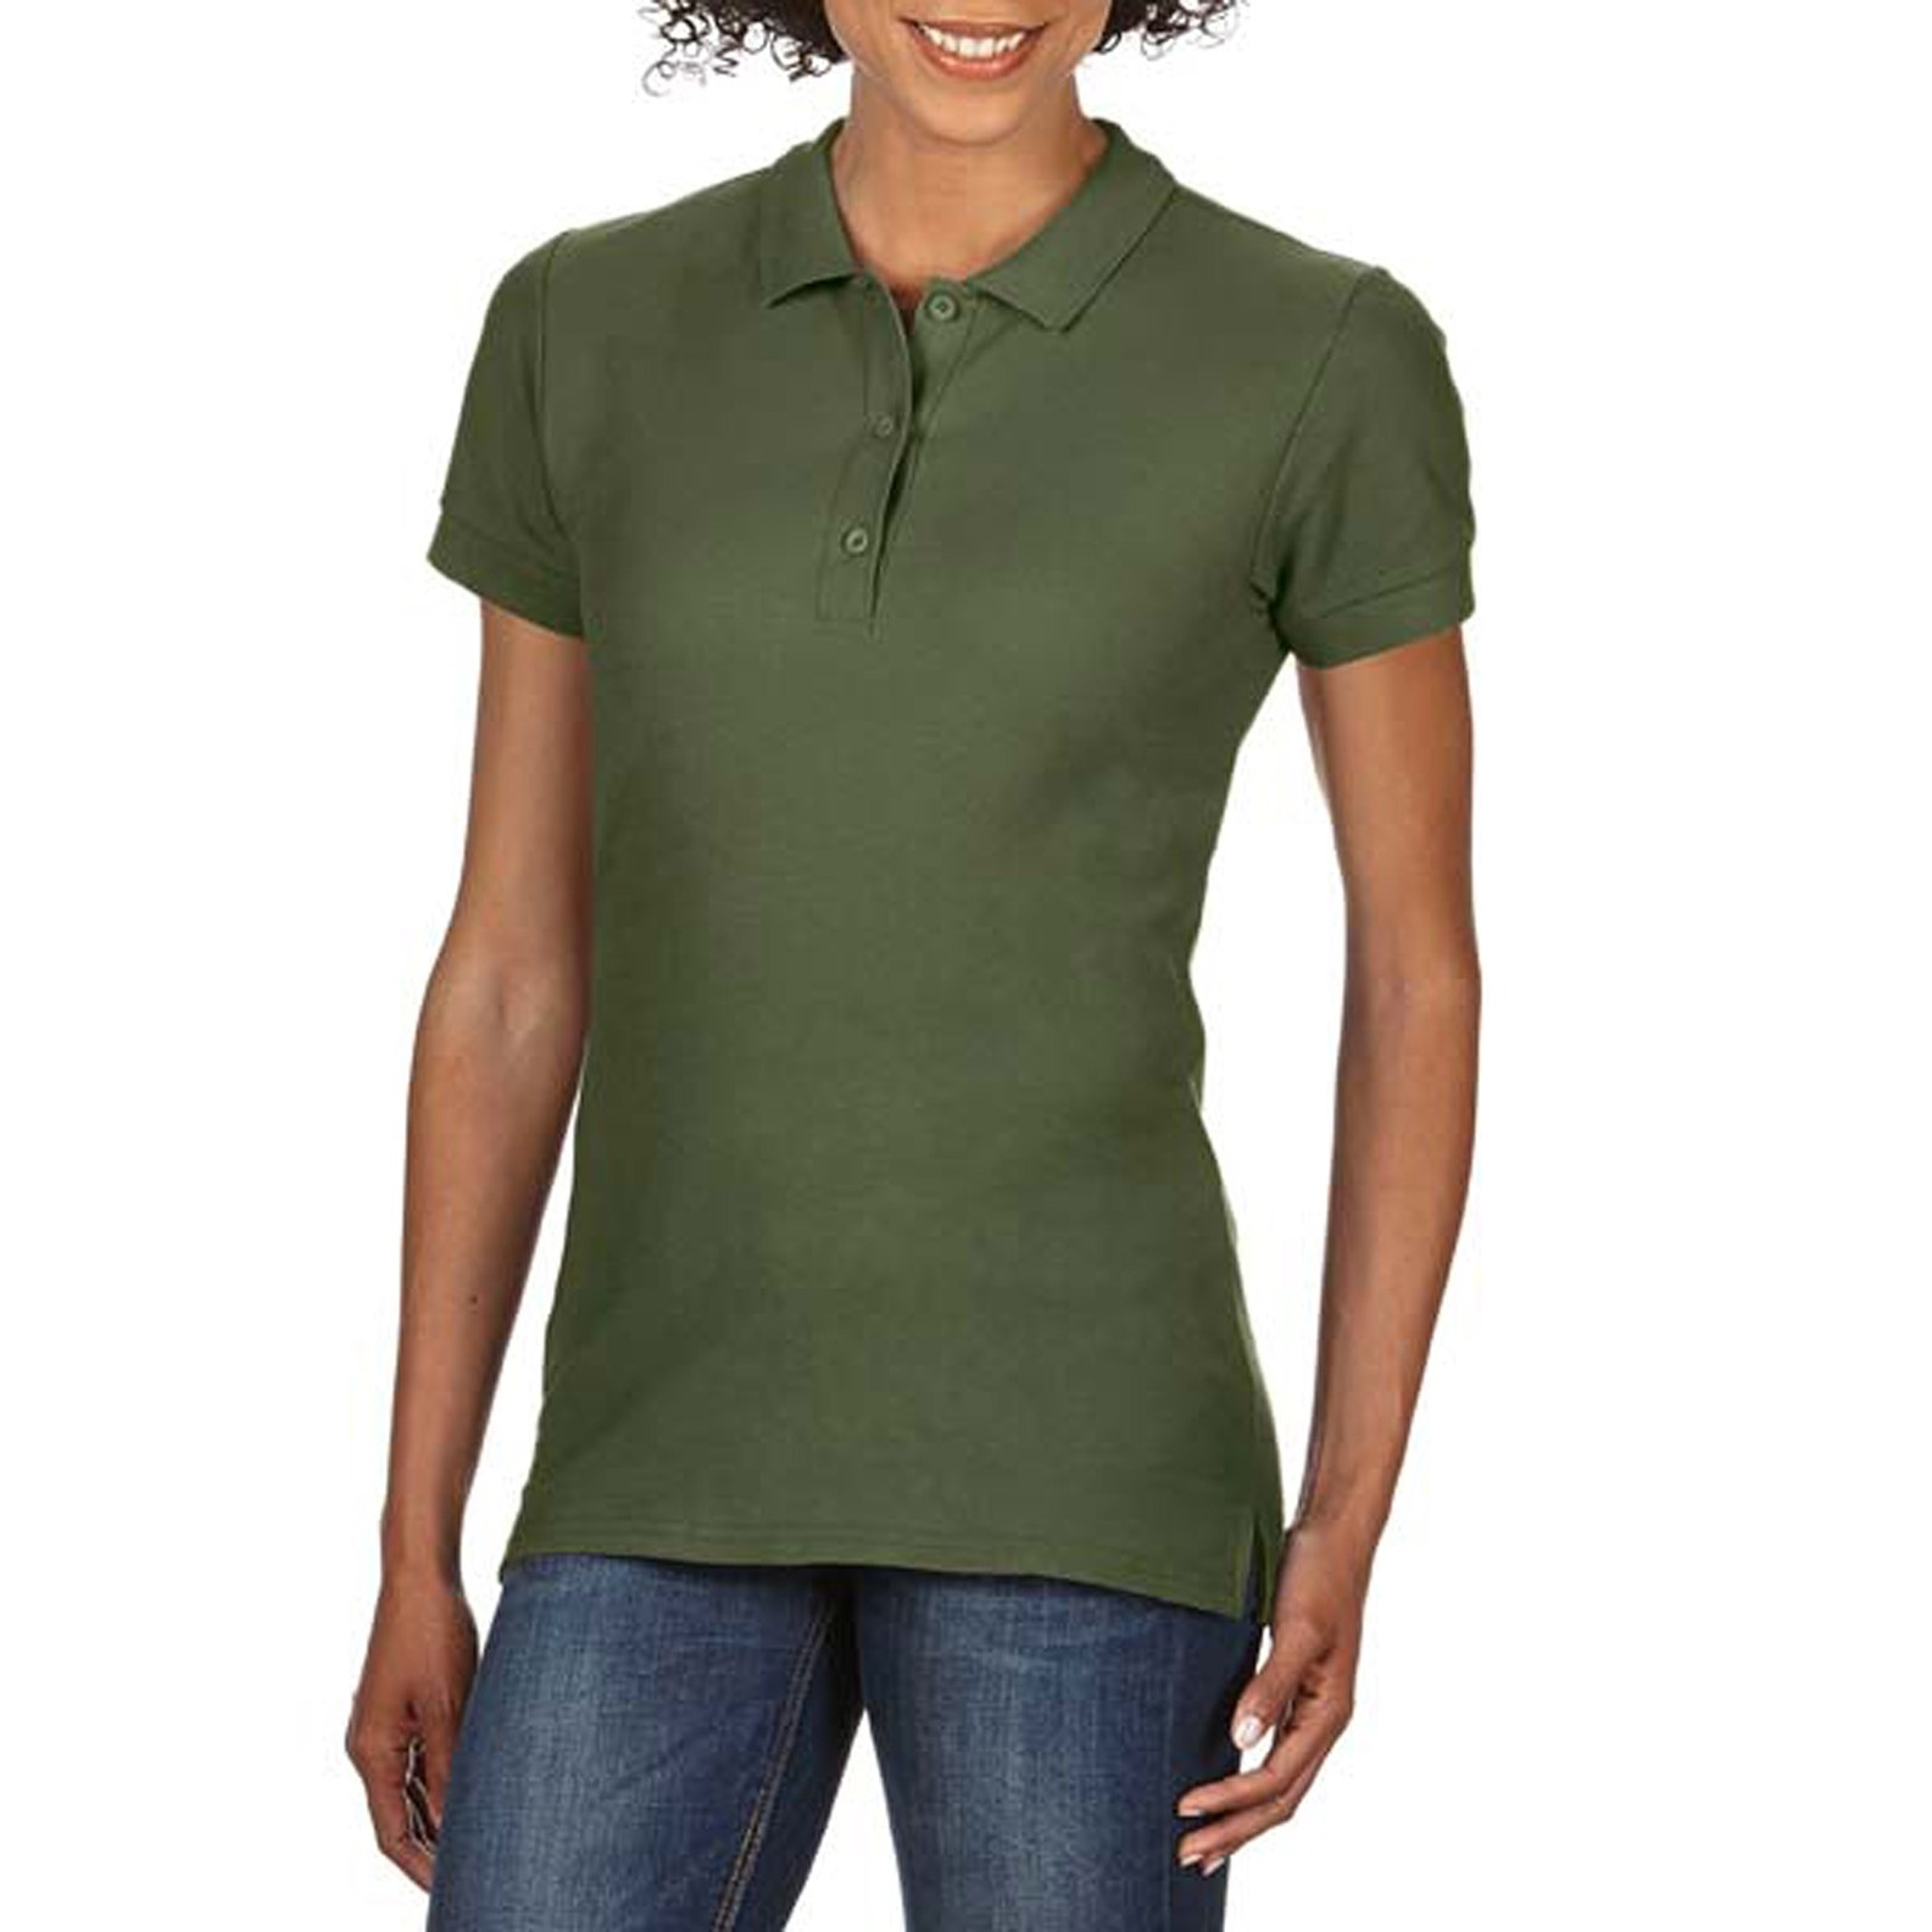 Gildan Womens/Ladies Premium Cotton Sport Double Pique Polo Shirt (L) (Military Green)